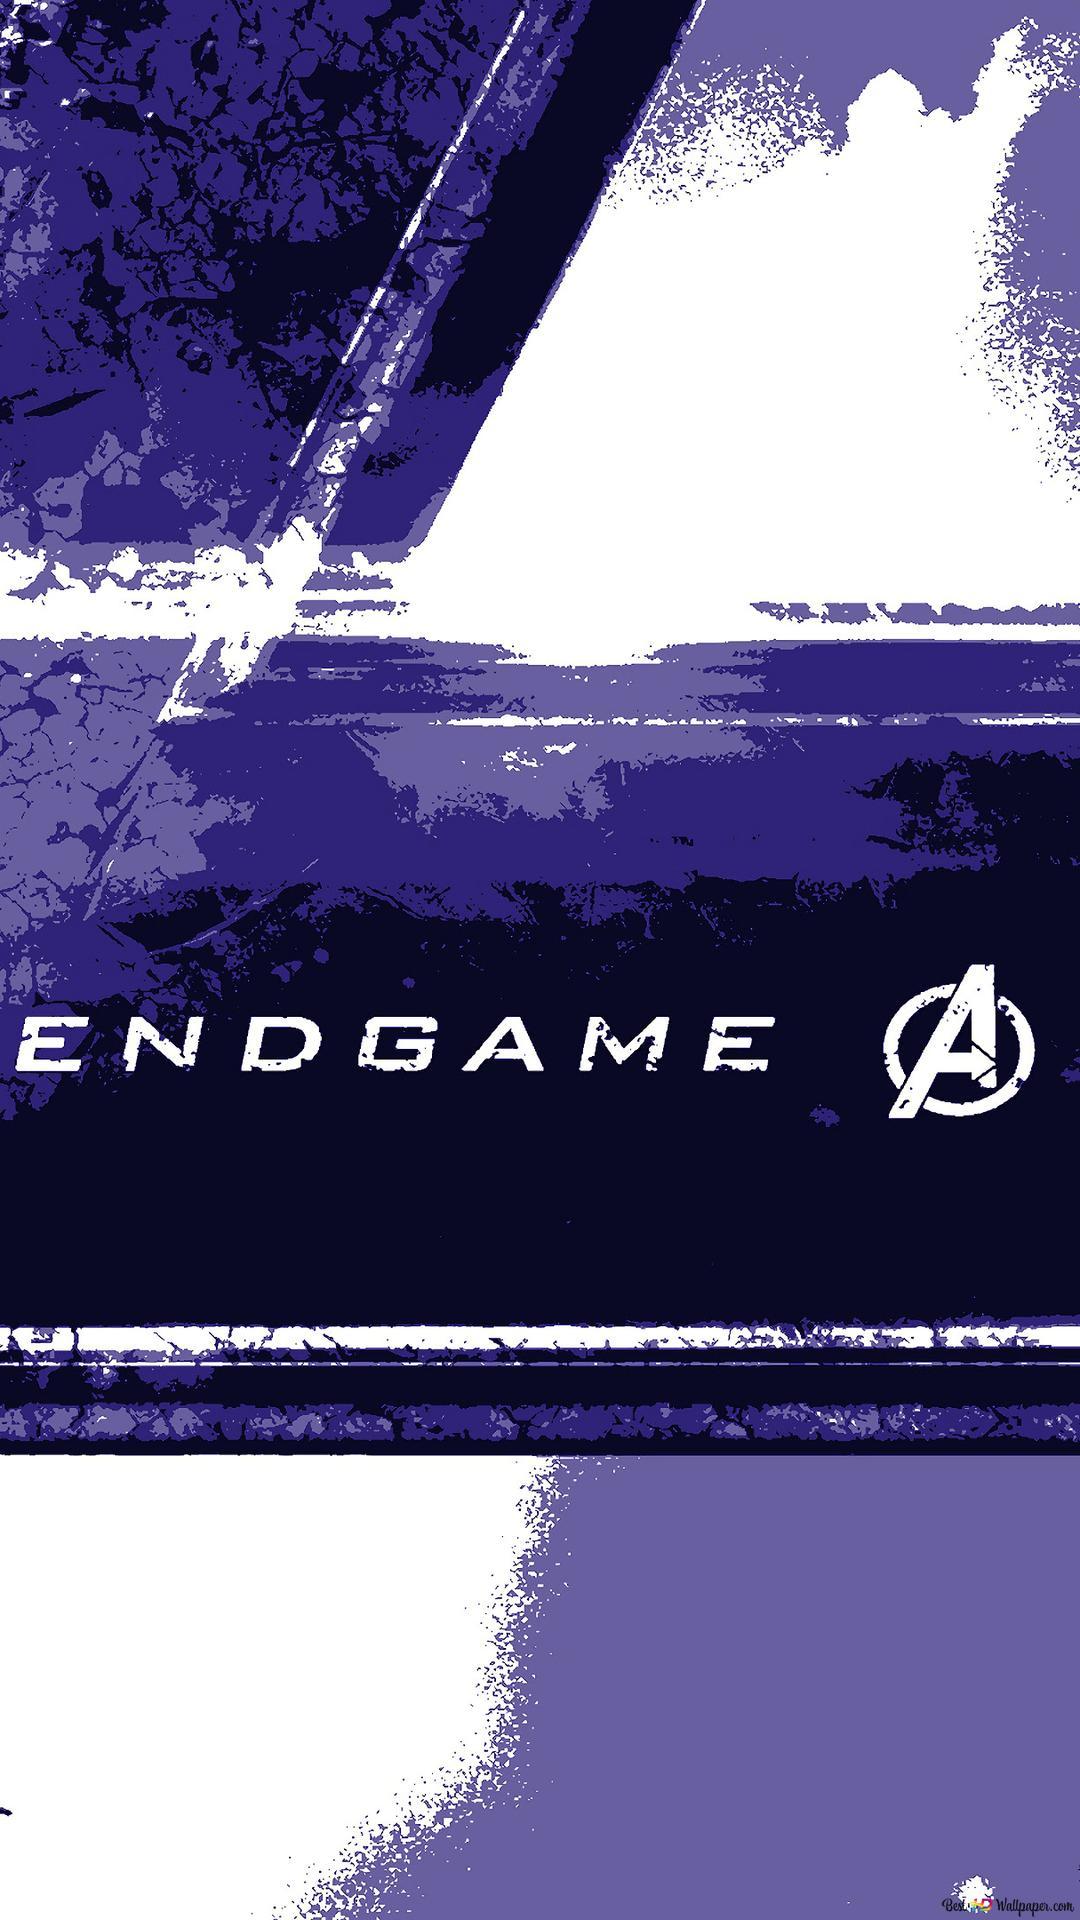 Avengers Endgame Logo Hd Wallpaper Download